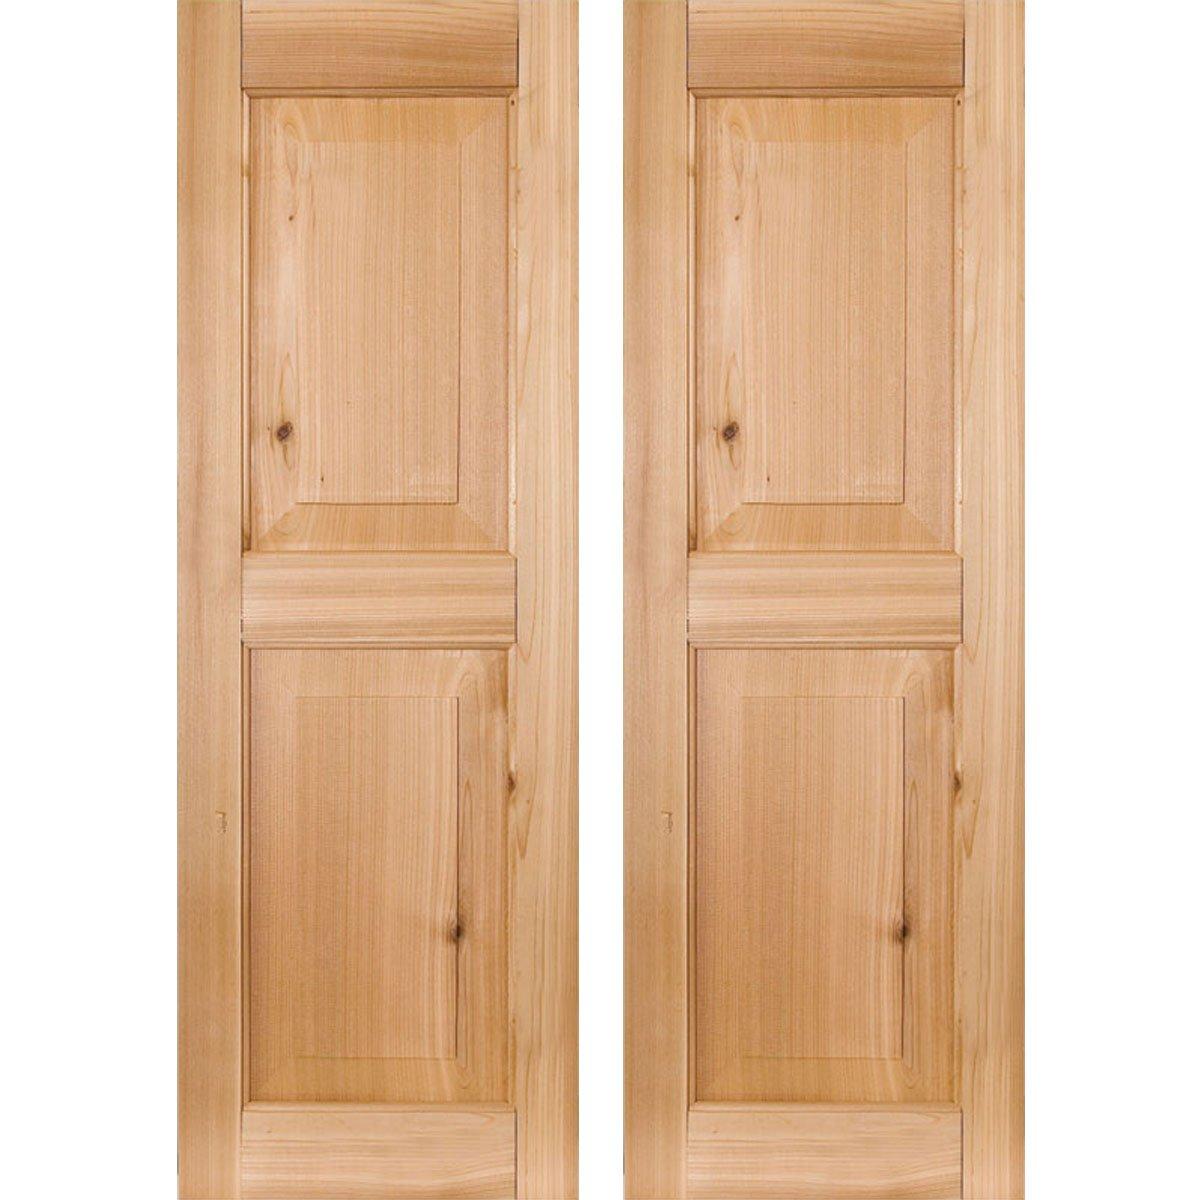 Ekena Millwork RWR12X056UNP Exterior Real Wood Pine Raised Panel Shutters (Per Pair), Unfinished, 12''W x 56''H by Ekena Millwork